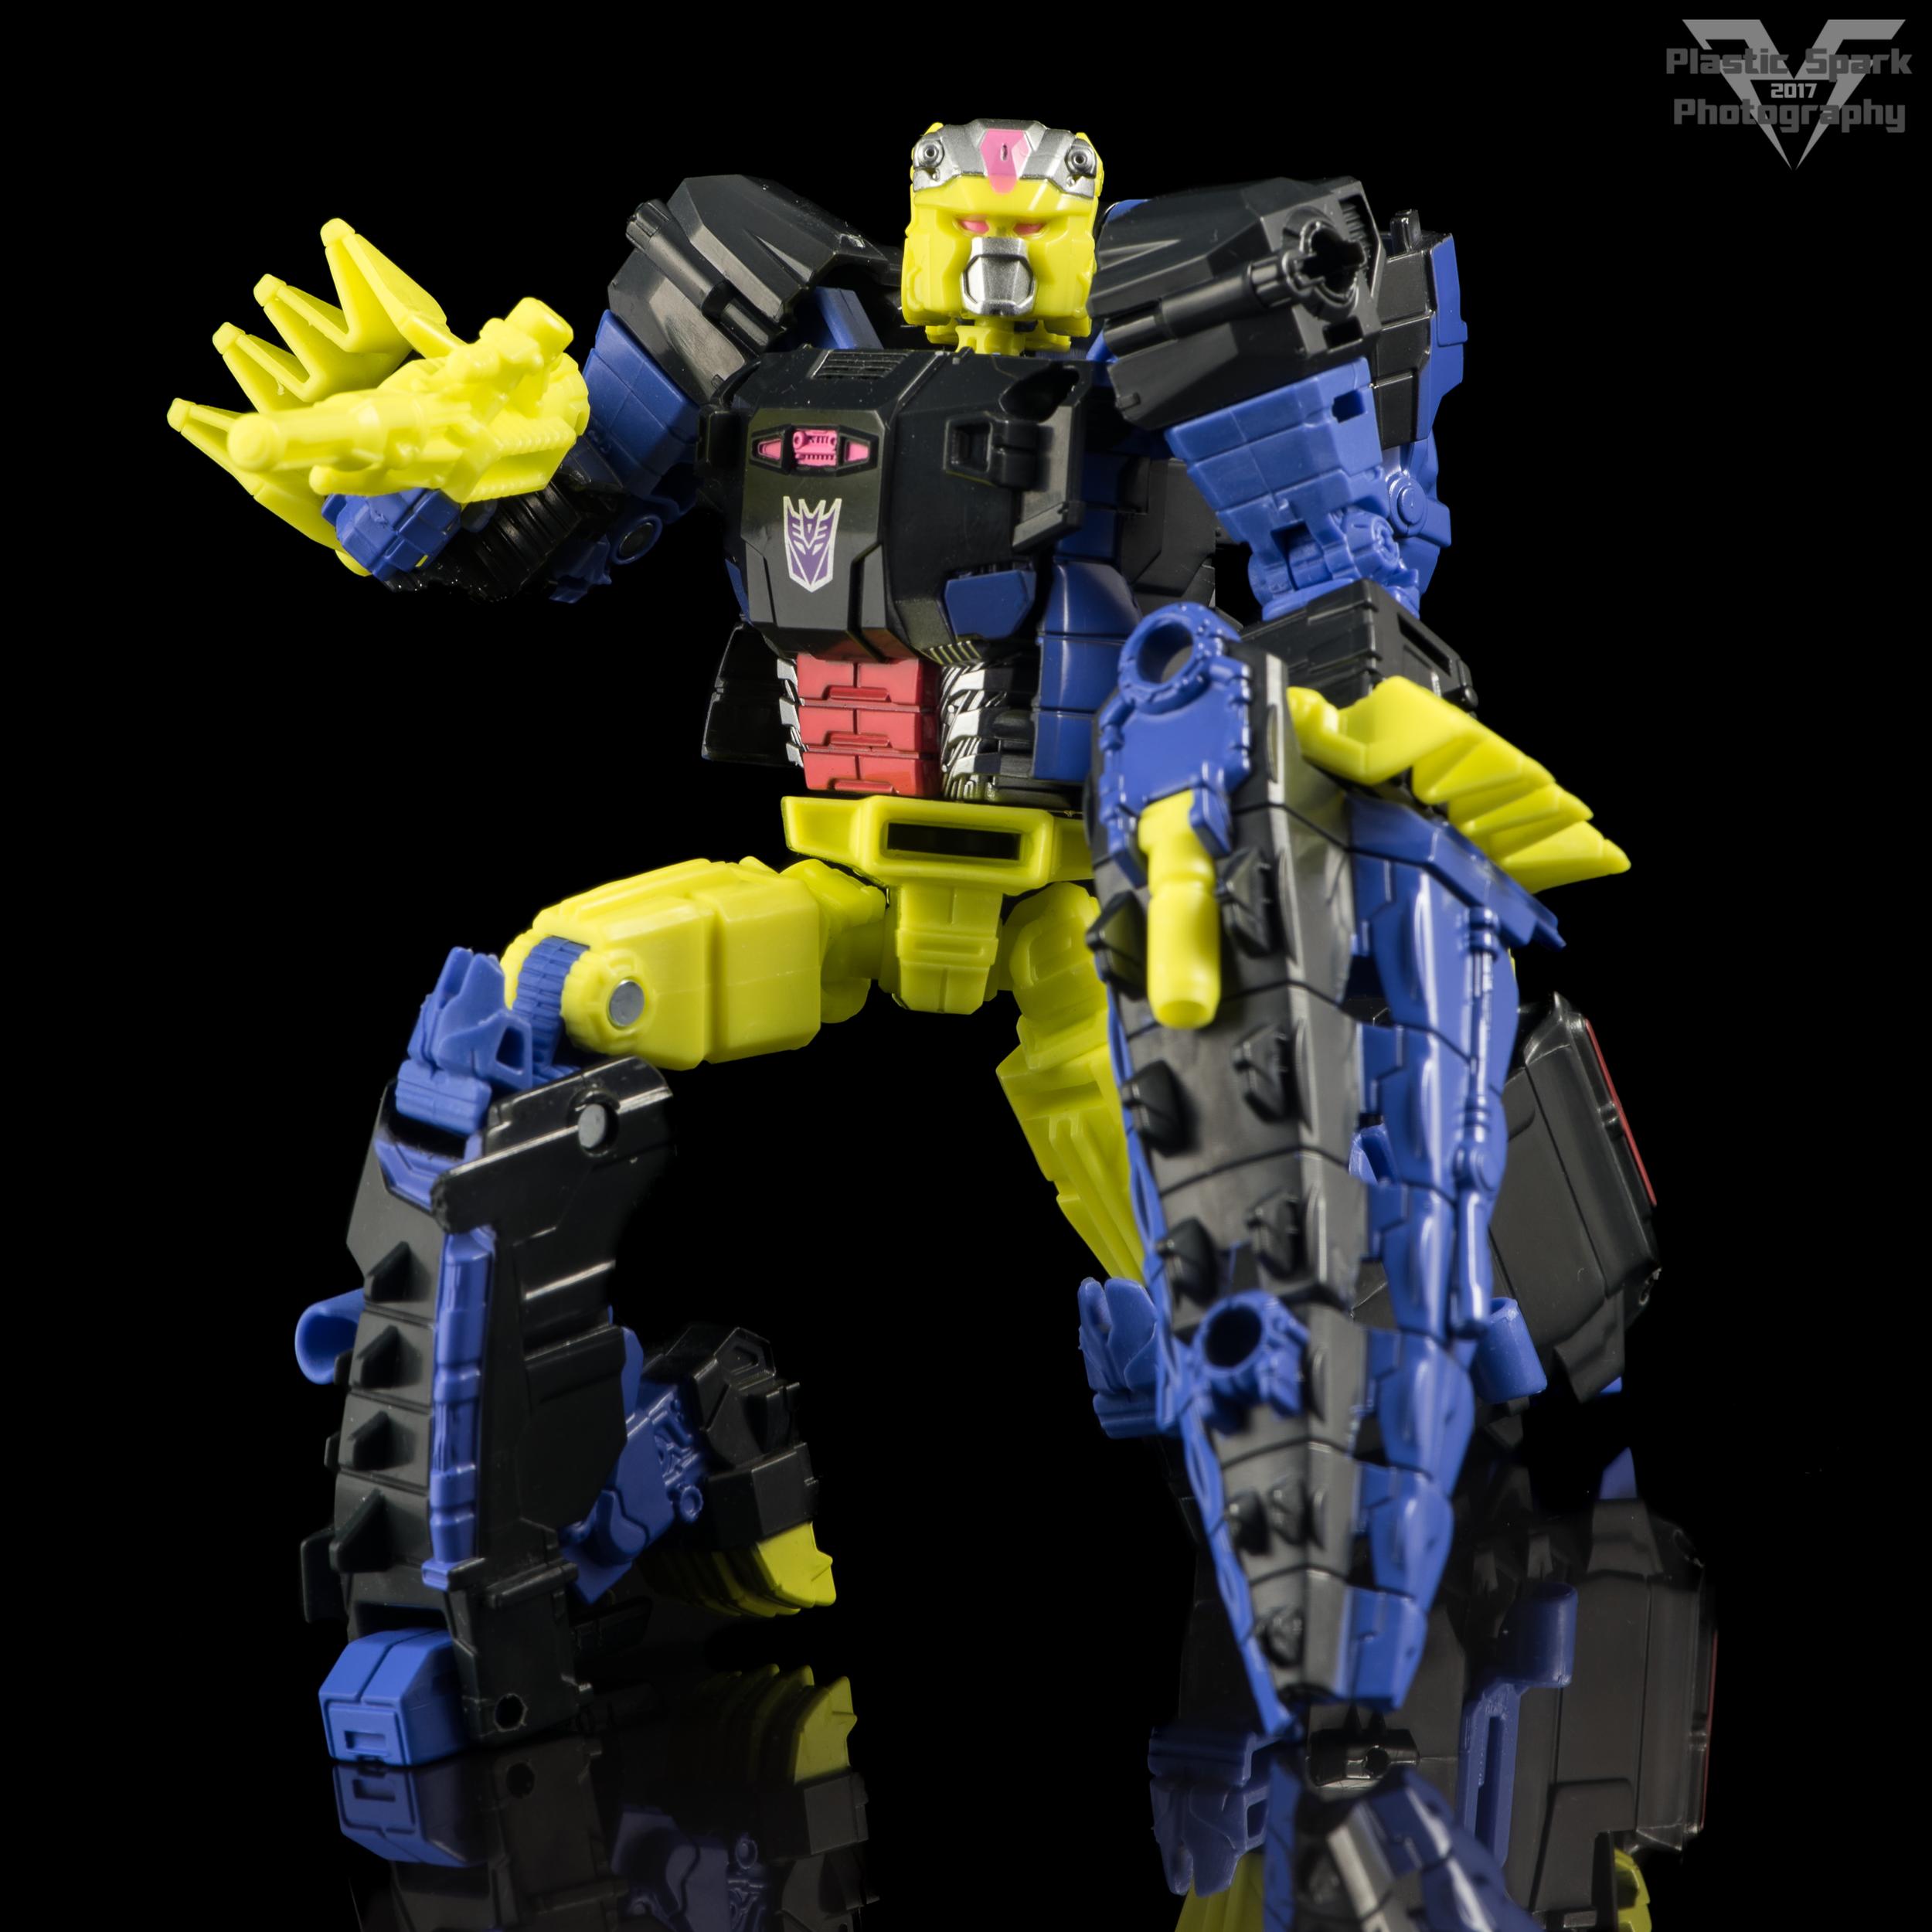 Hasbro-Titans-Return-Deluxe-Krok-(5-of-10).png